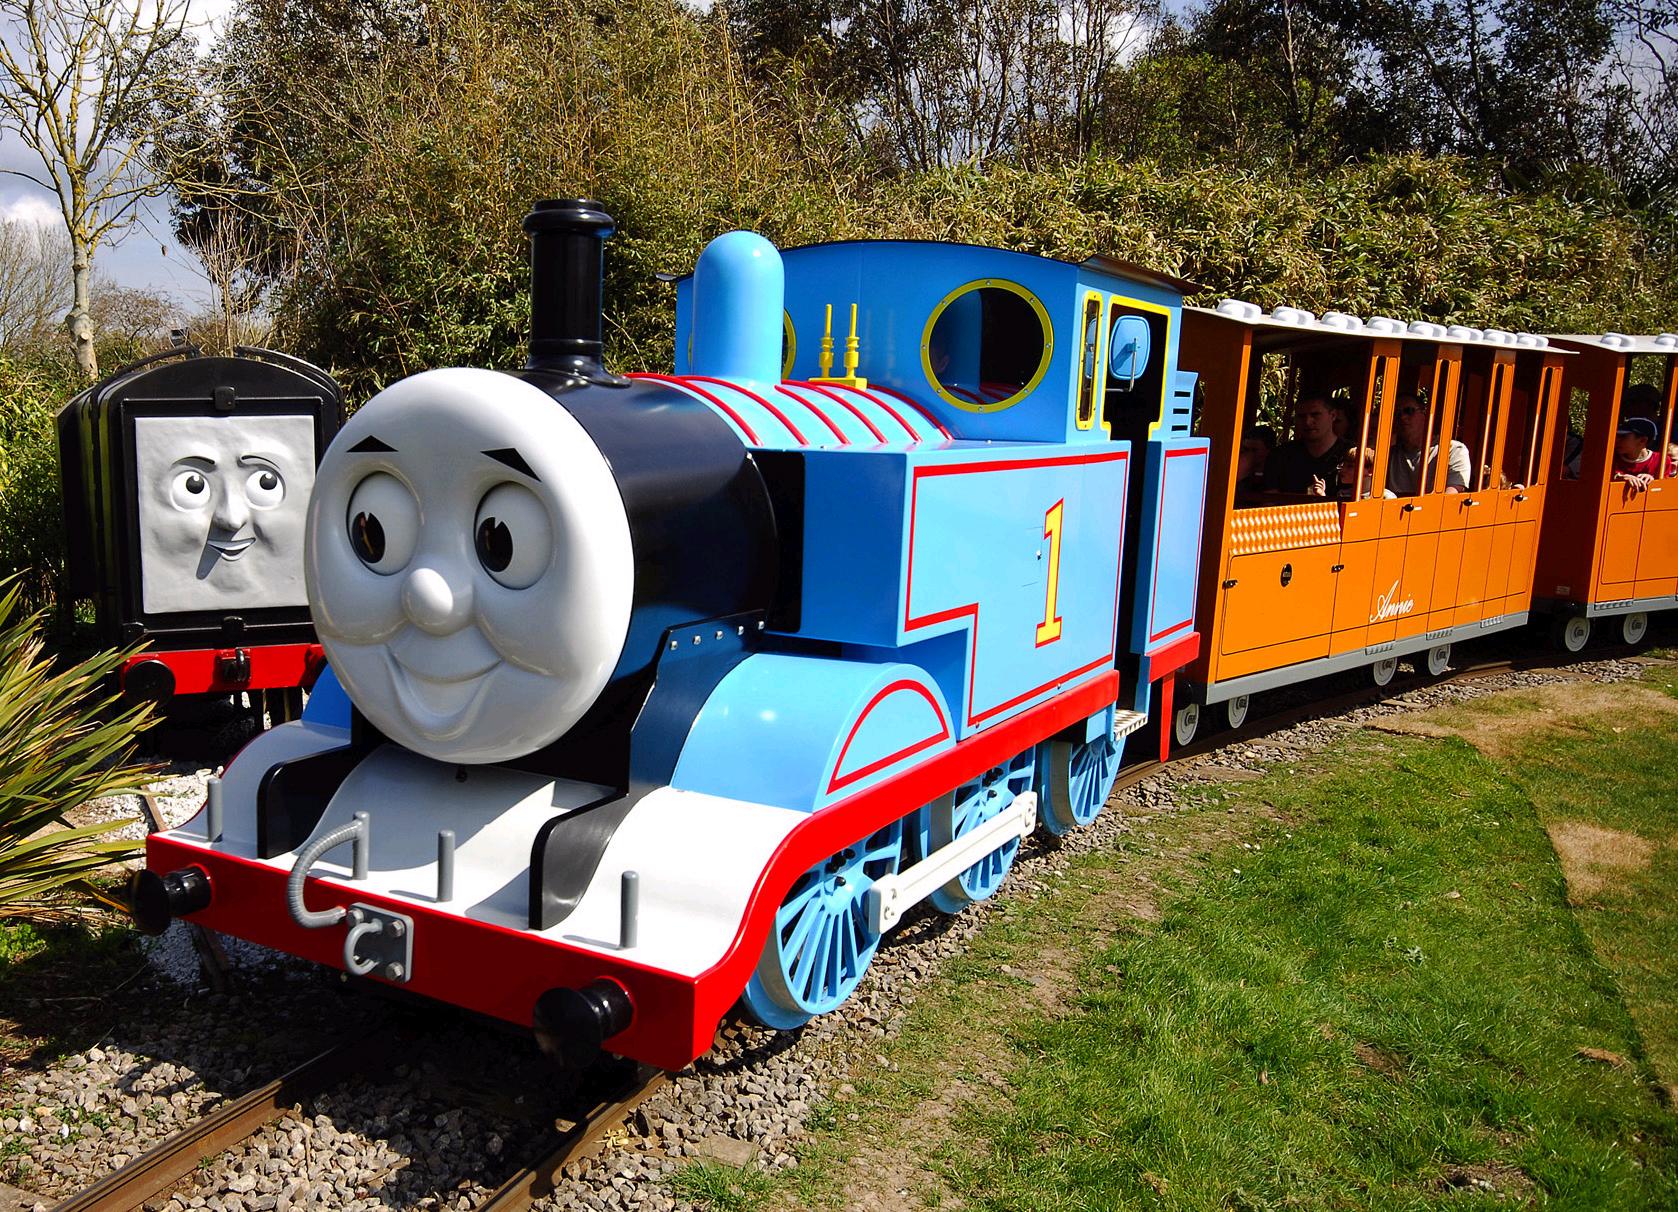 Thomas and Friends - Wikidata